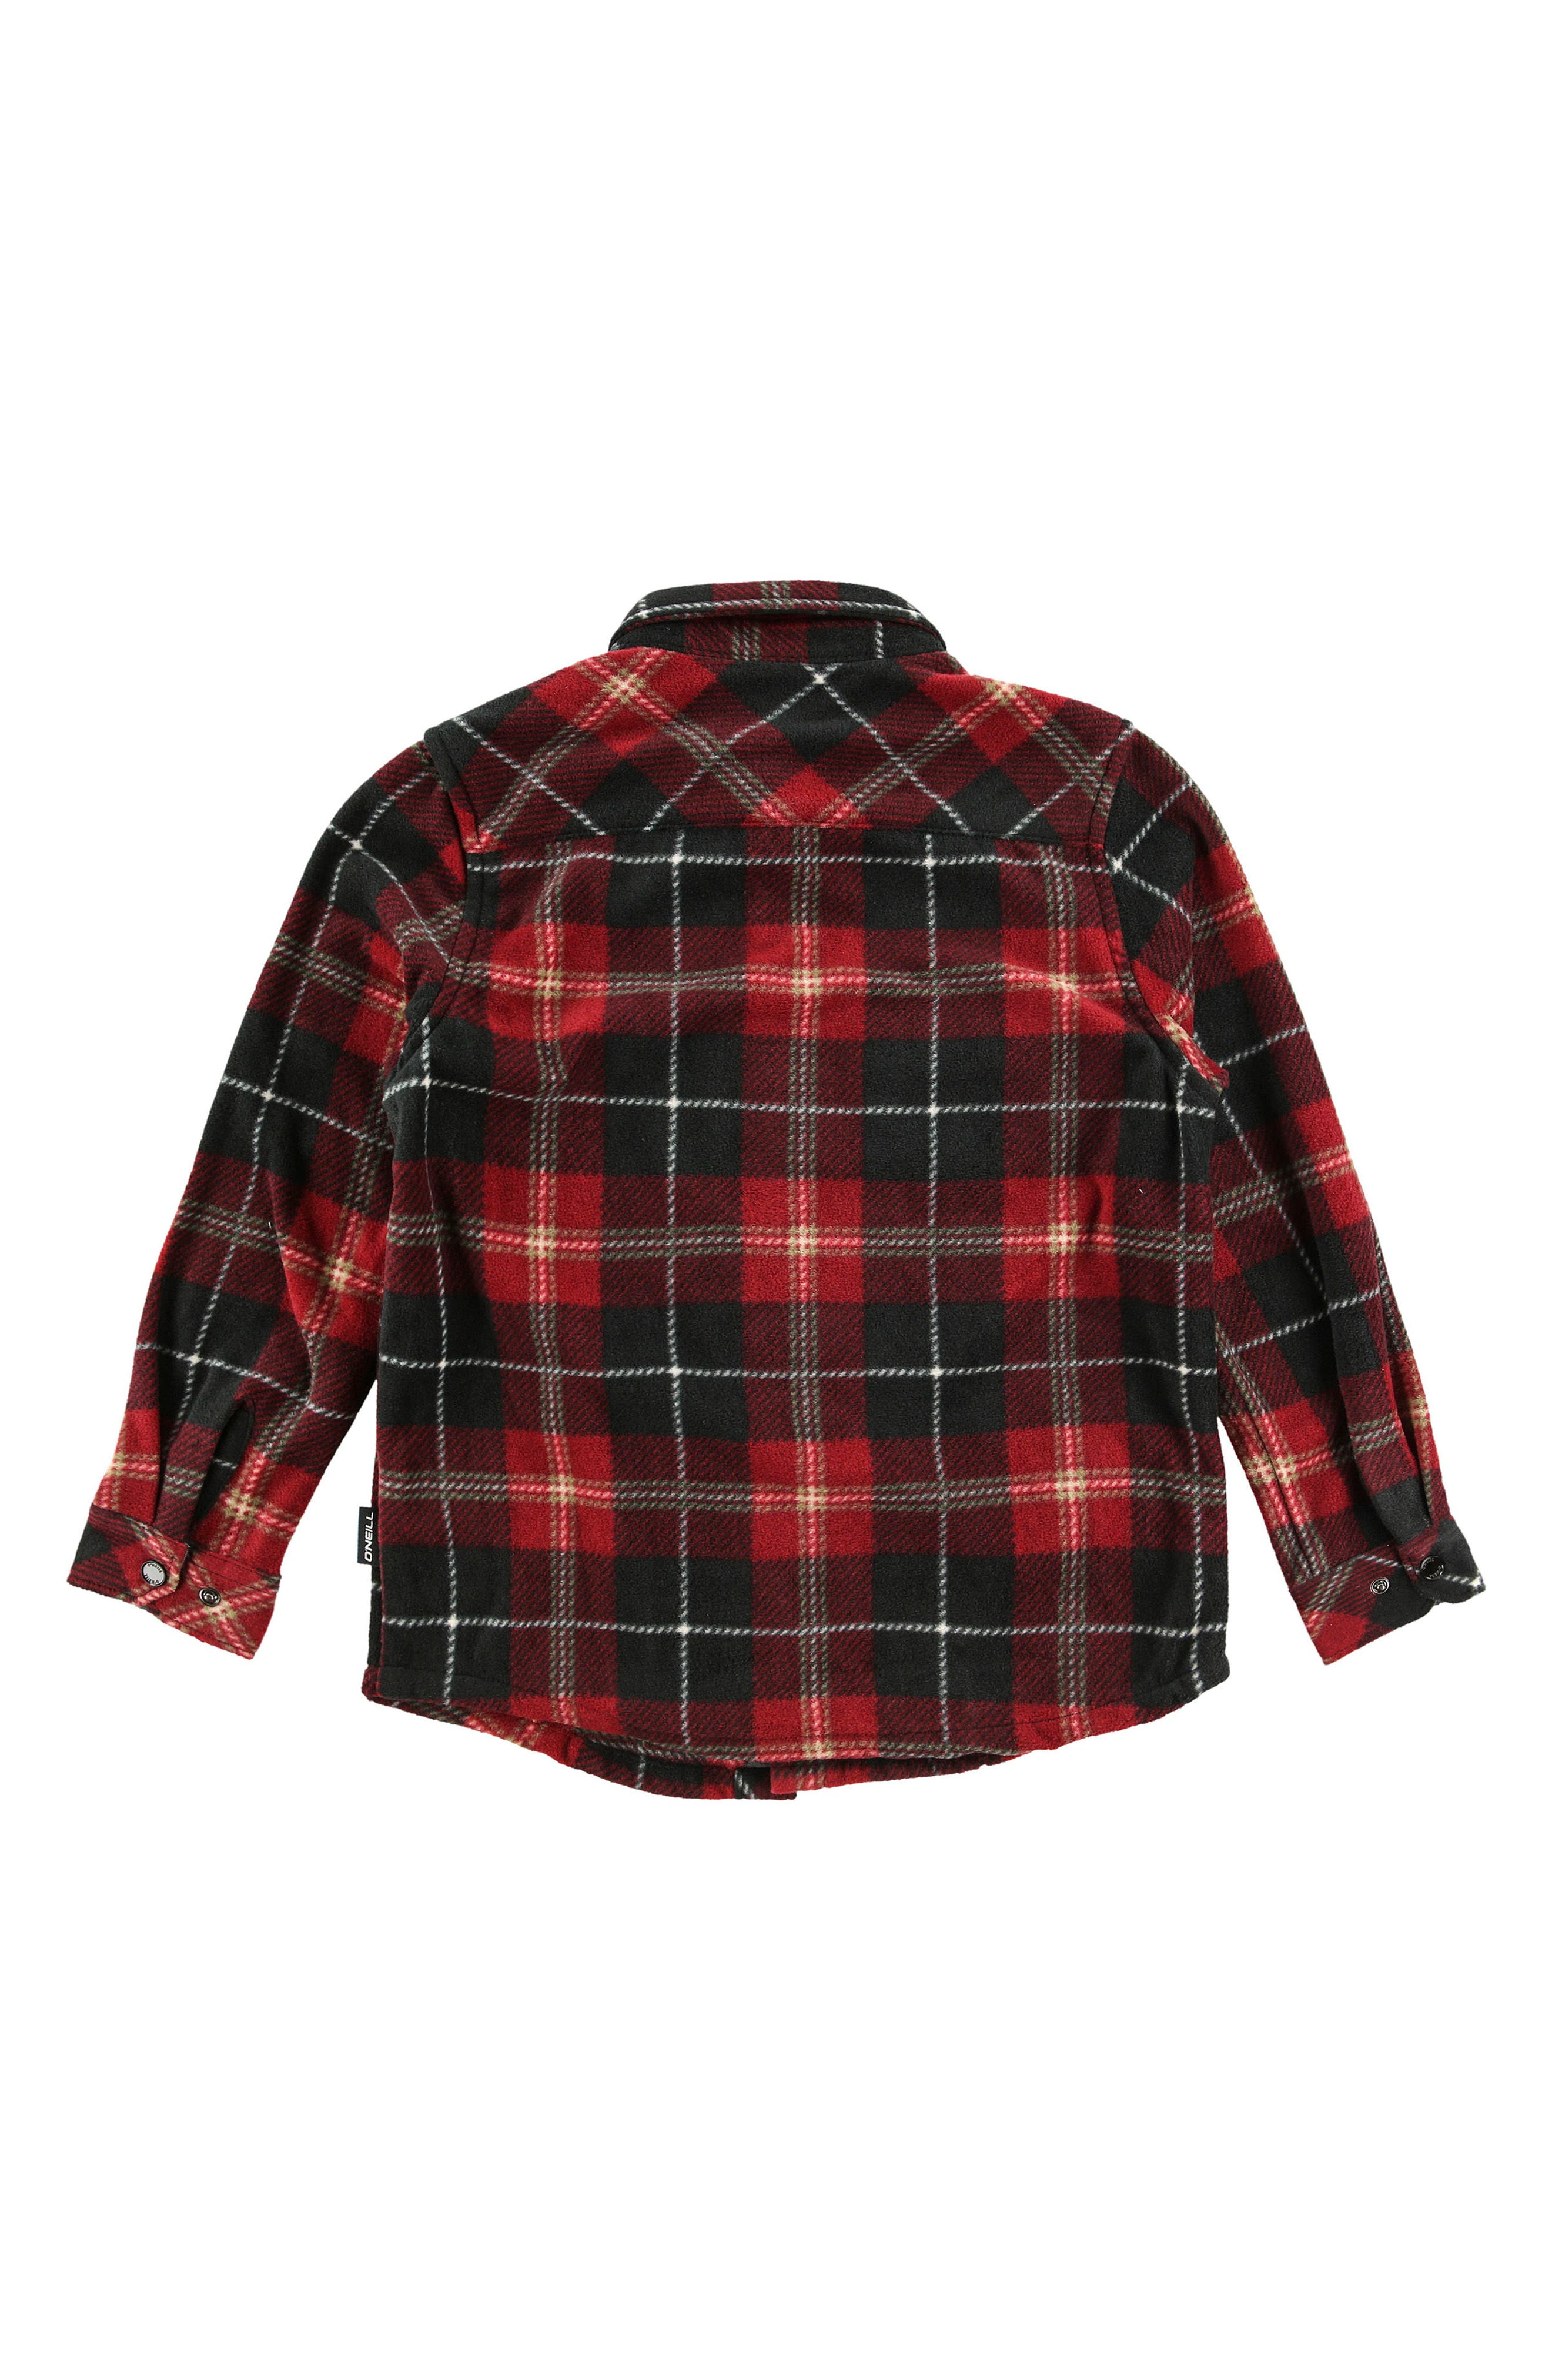 Glacier Plaid Shirt,                             Main thumbnail 1, color,                             001